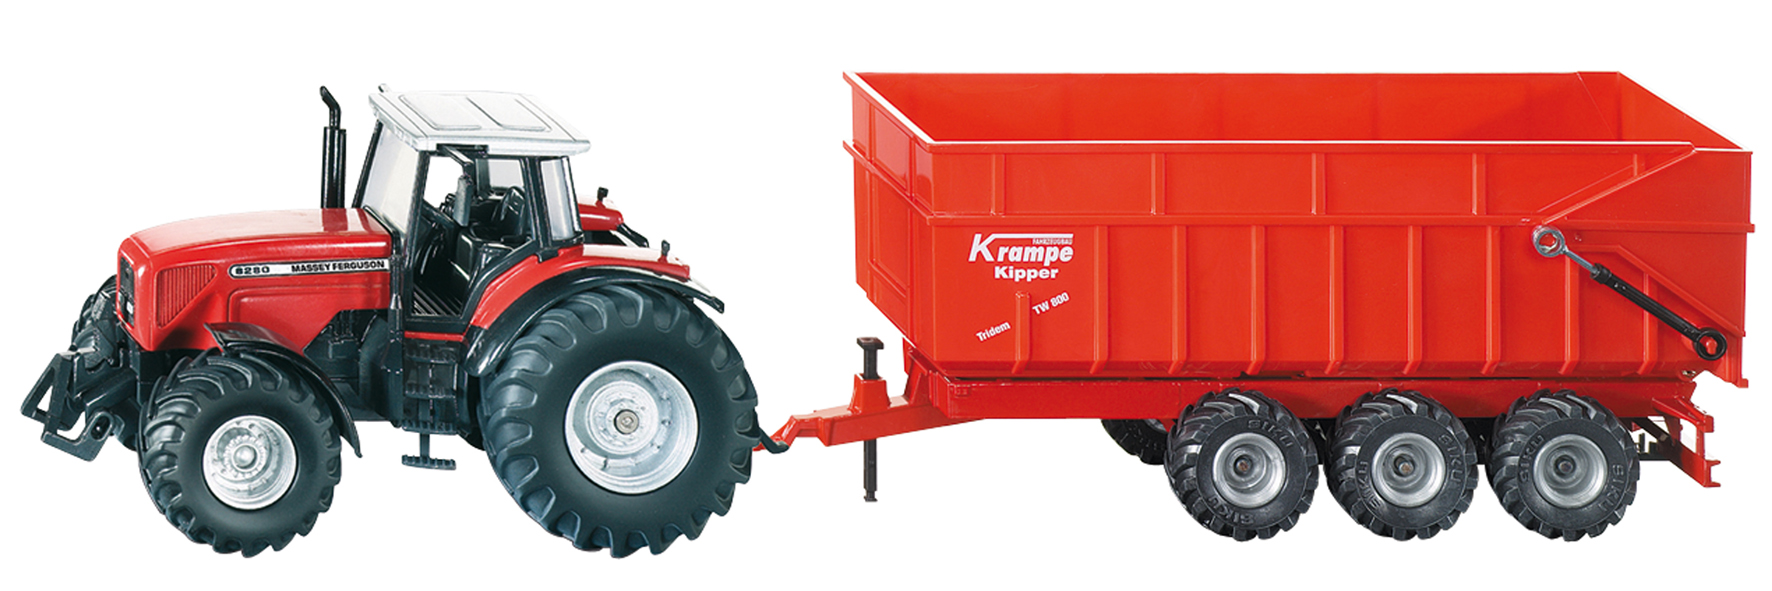 massey ferguson tracteur avec remorque 3 essieux 187